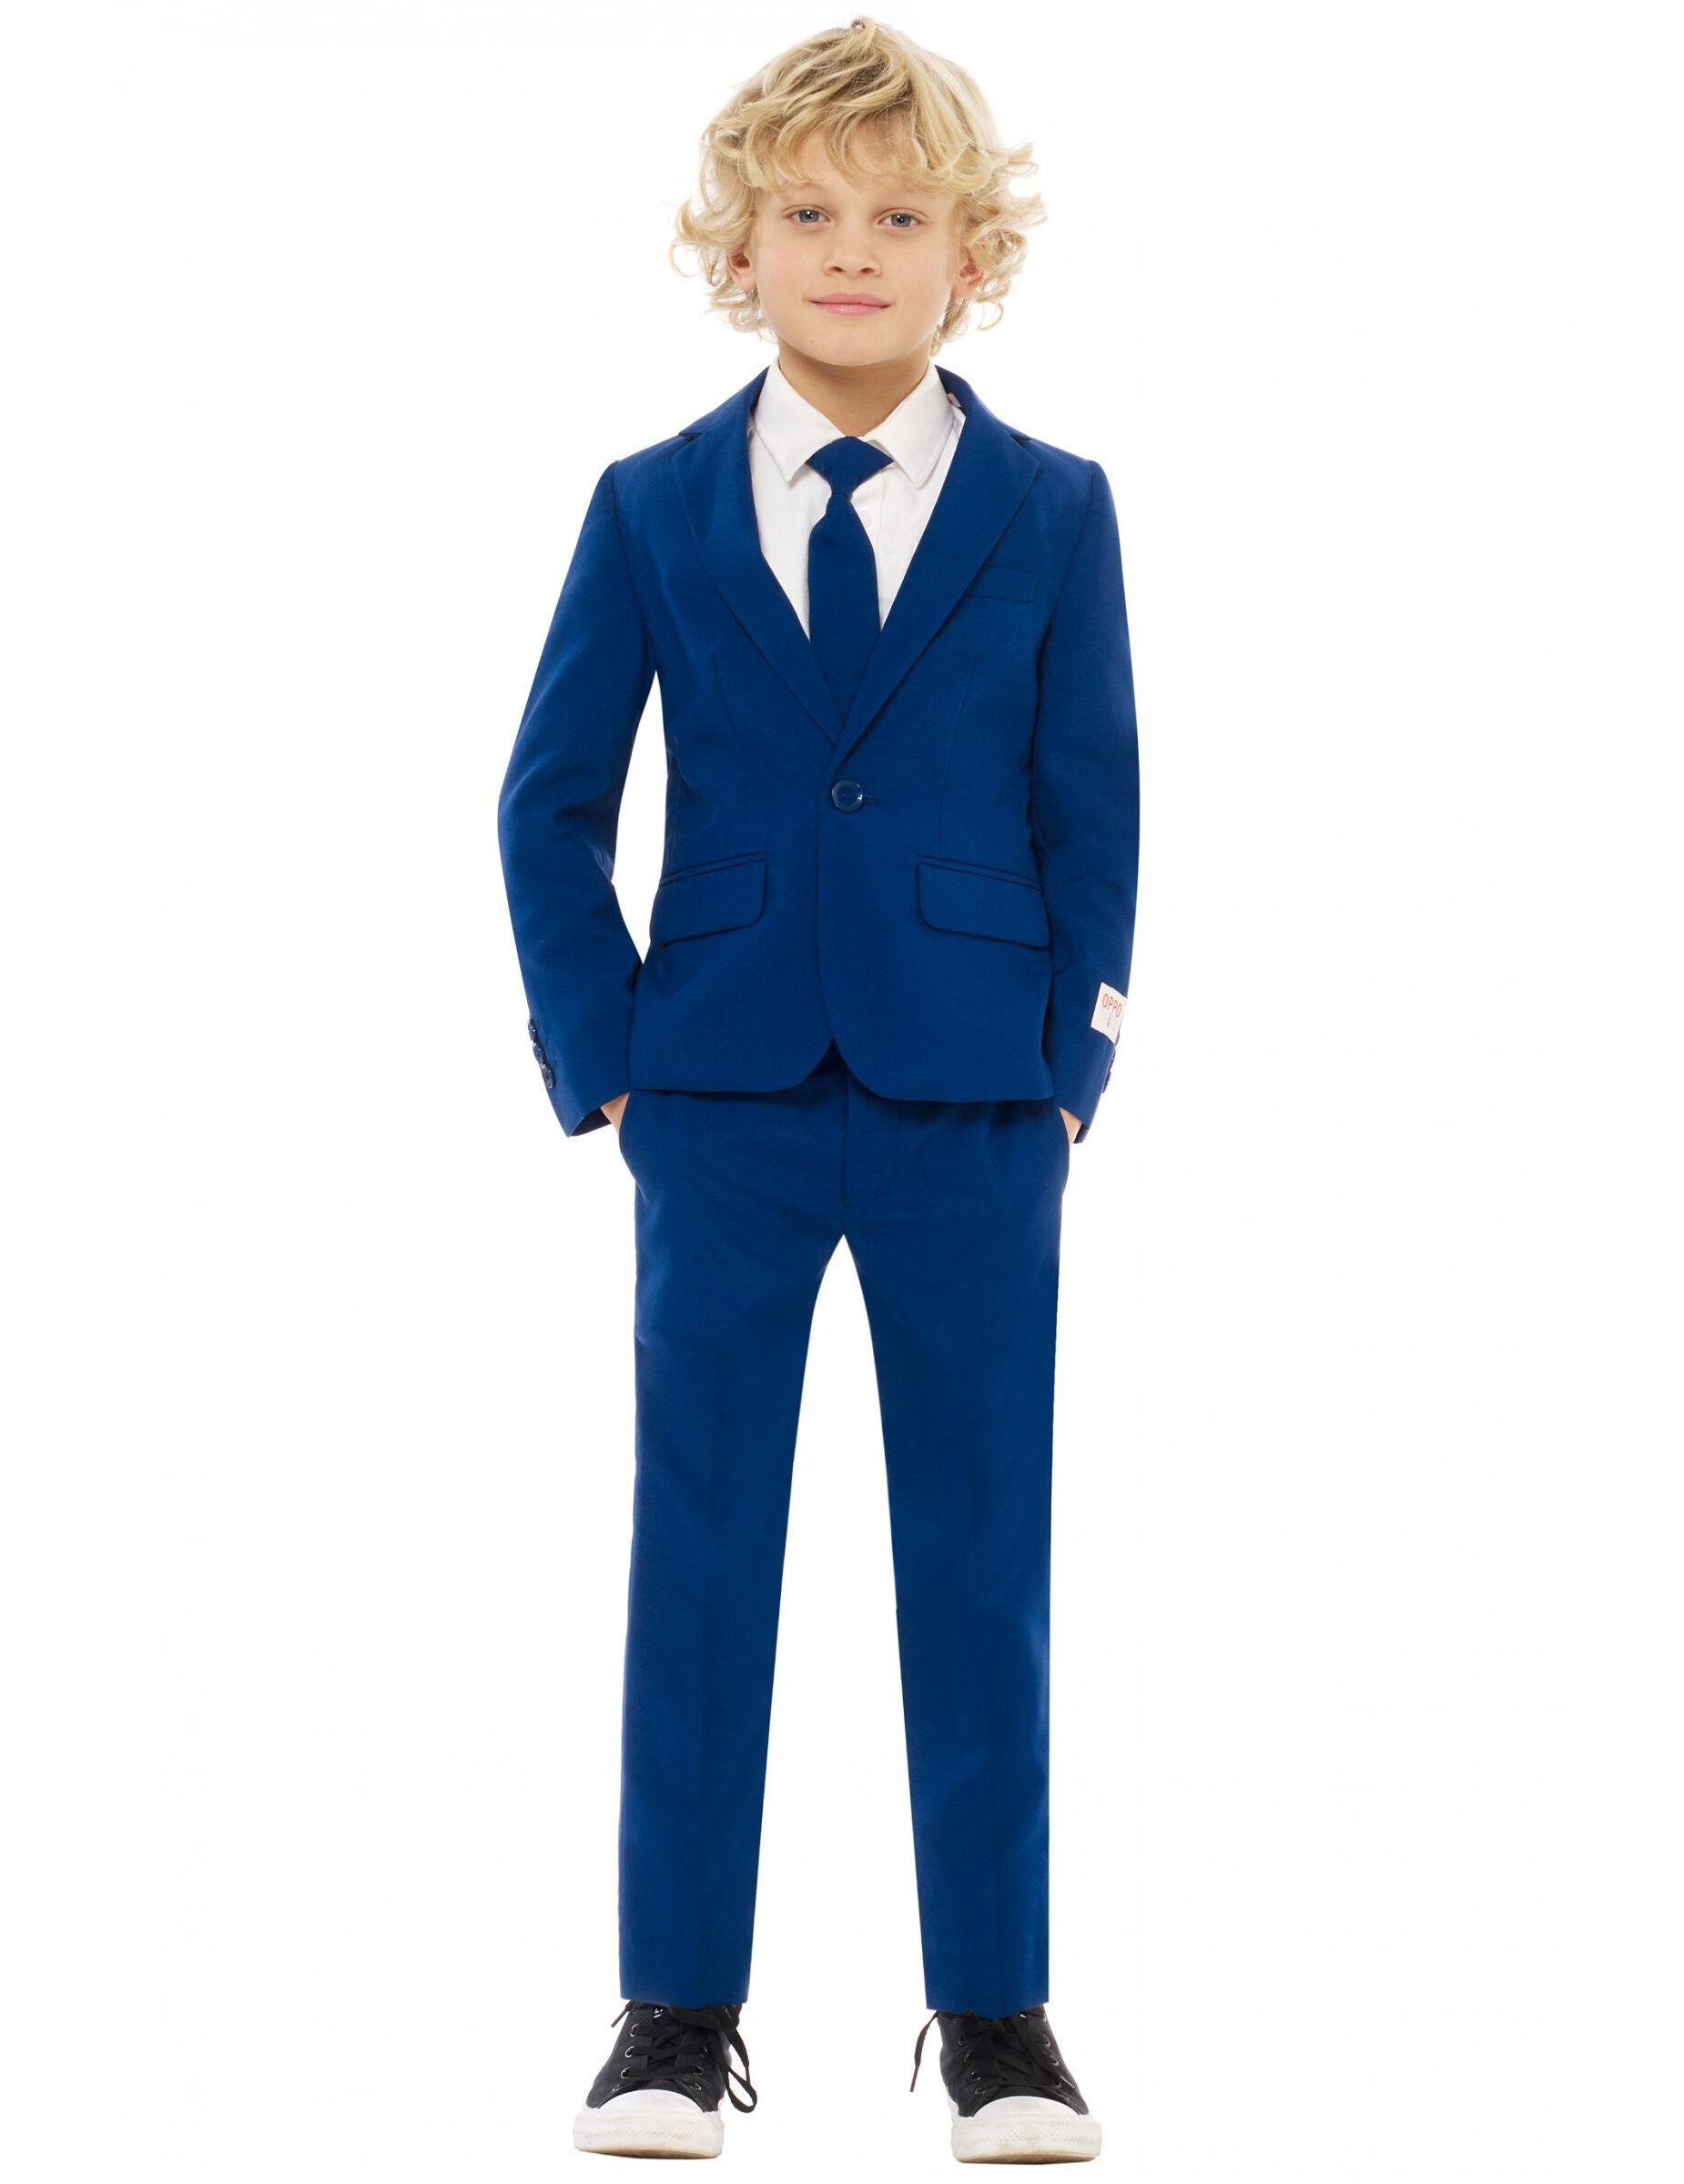 Deguisetoi Costume Mr. Bleu marine enfant Opposuits - Taille: 4-6 ans (98-104 cm)